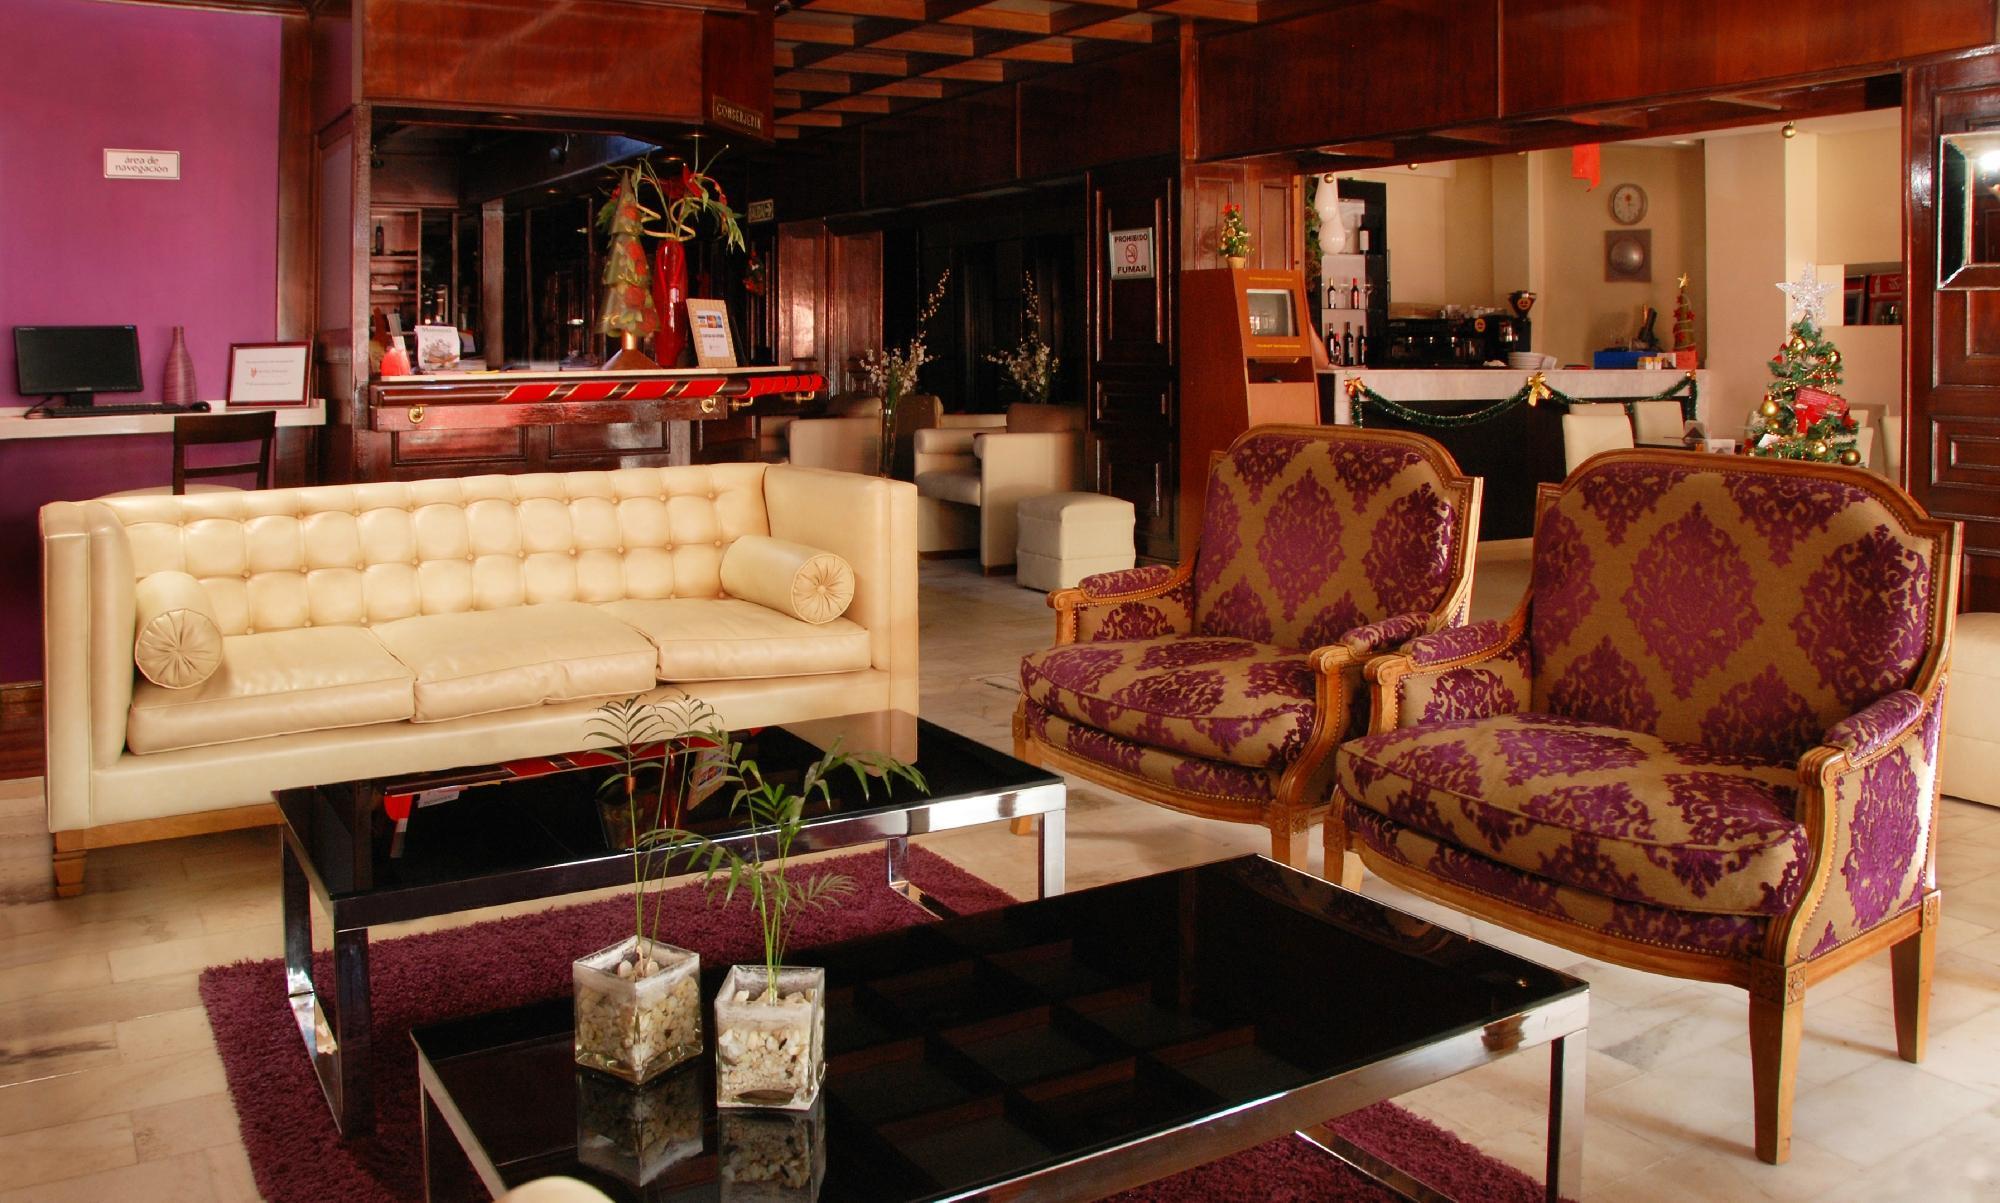 Posadas Hotel